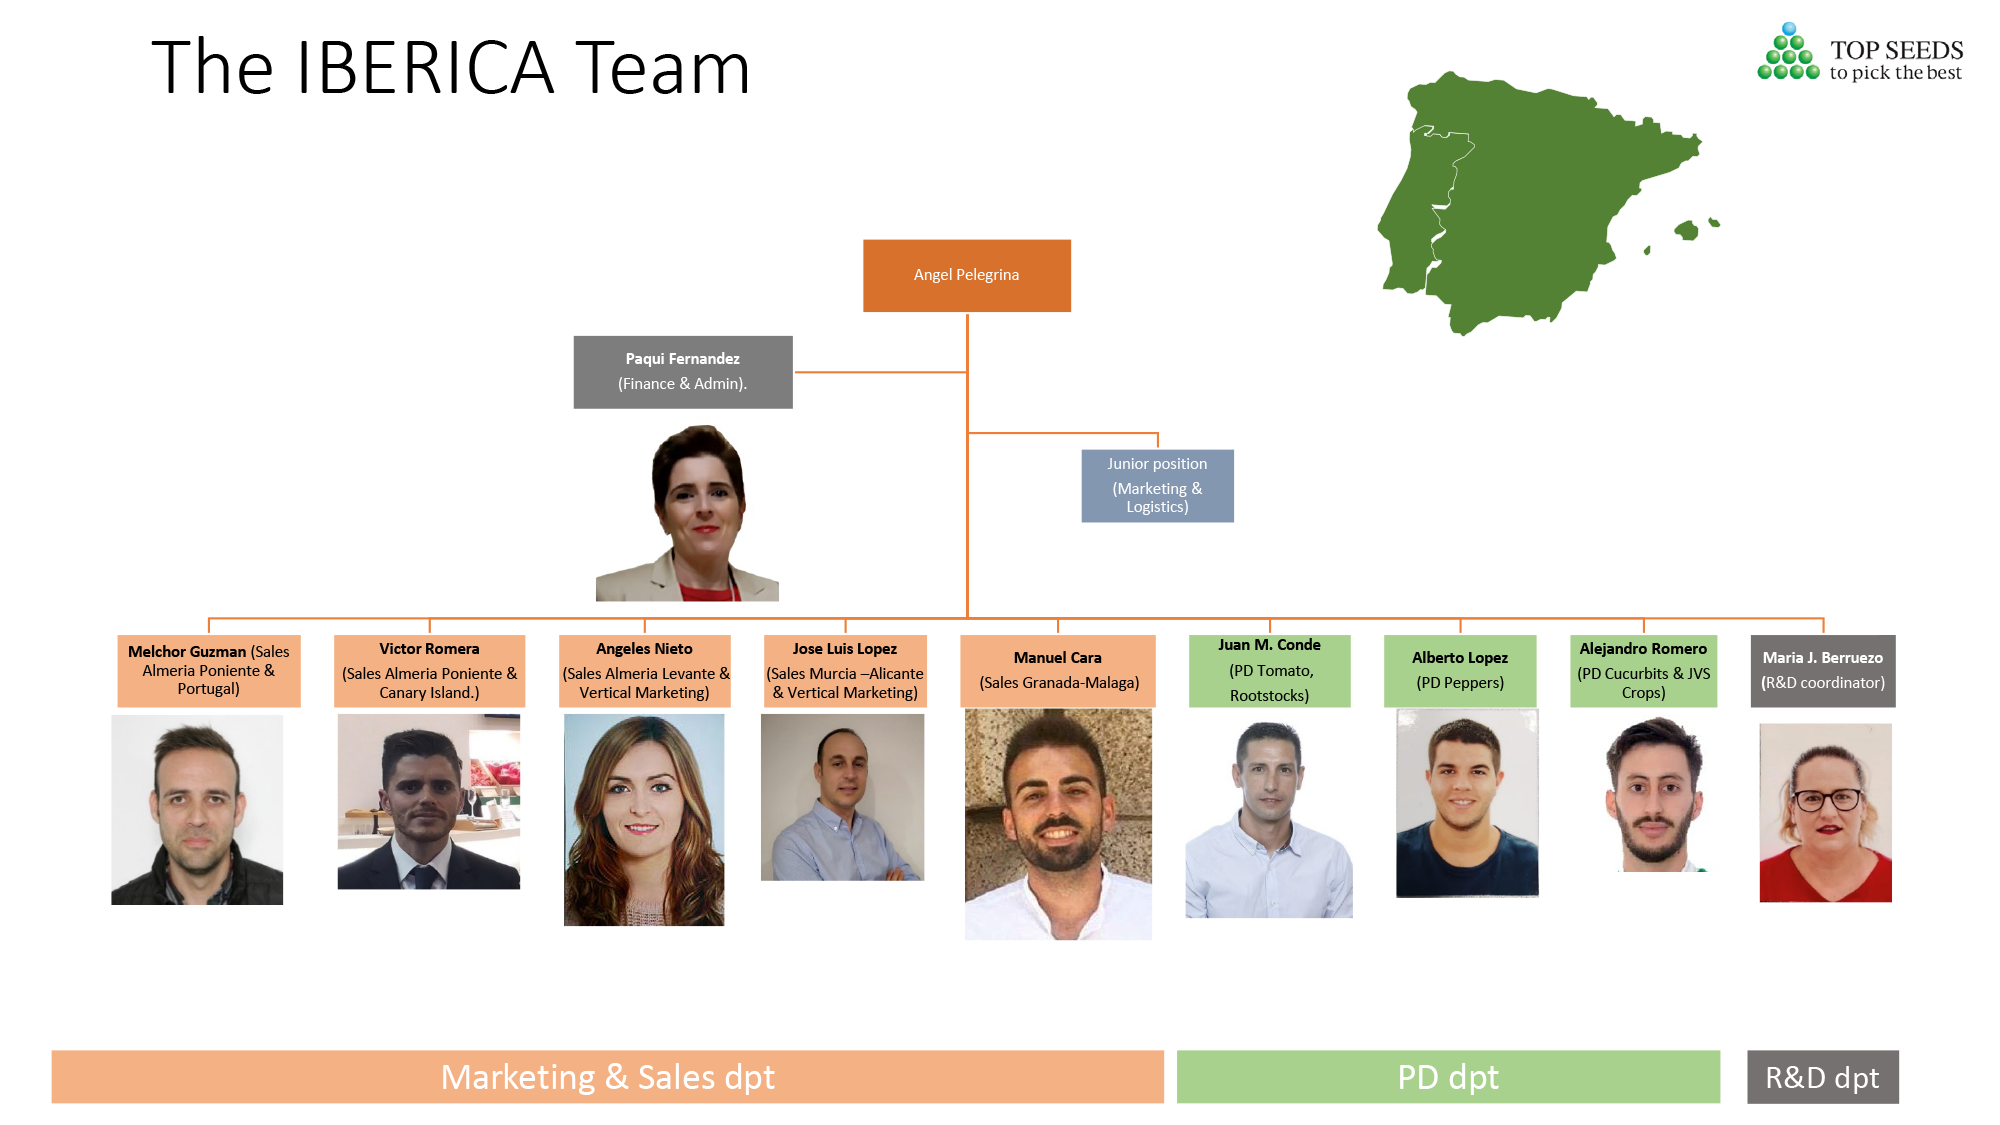 The IBERICA Team